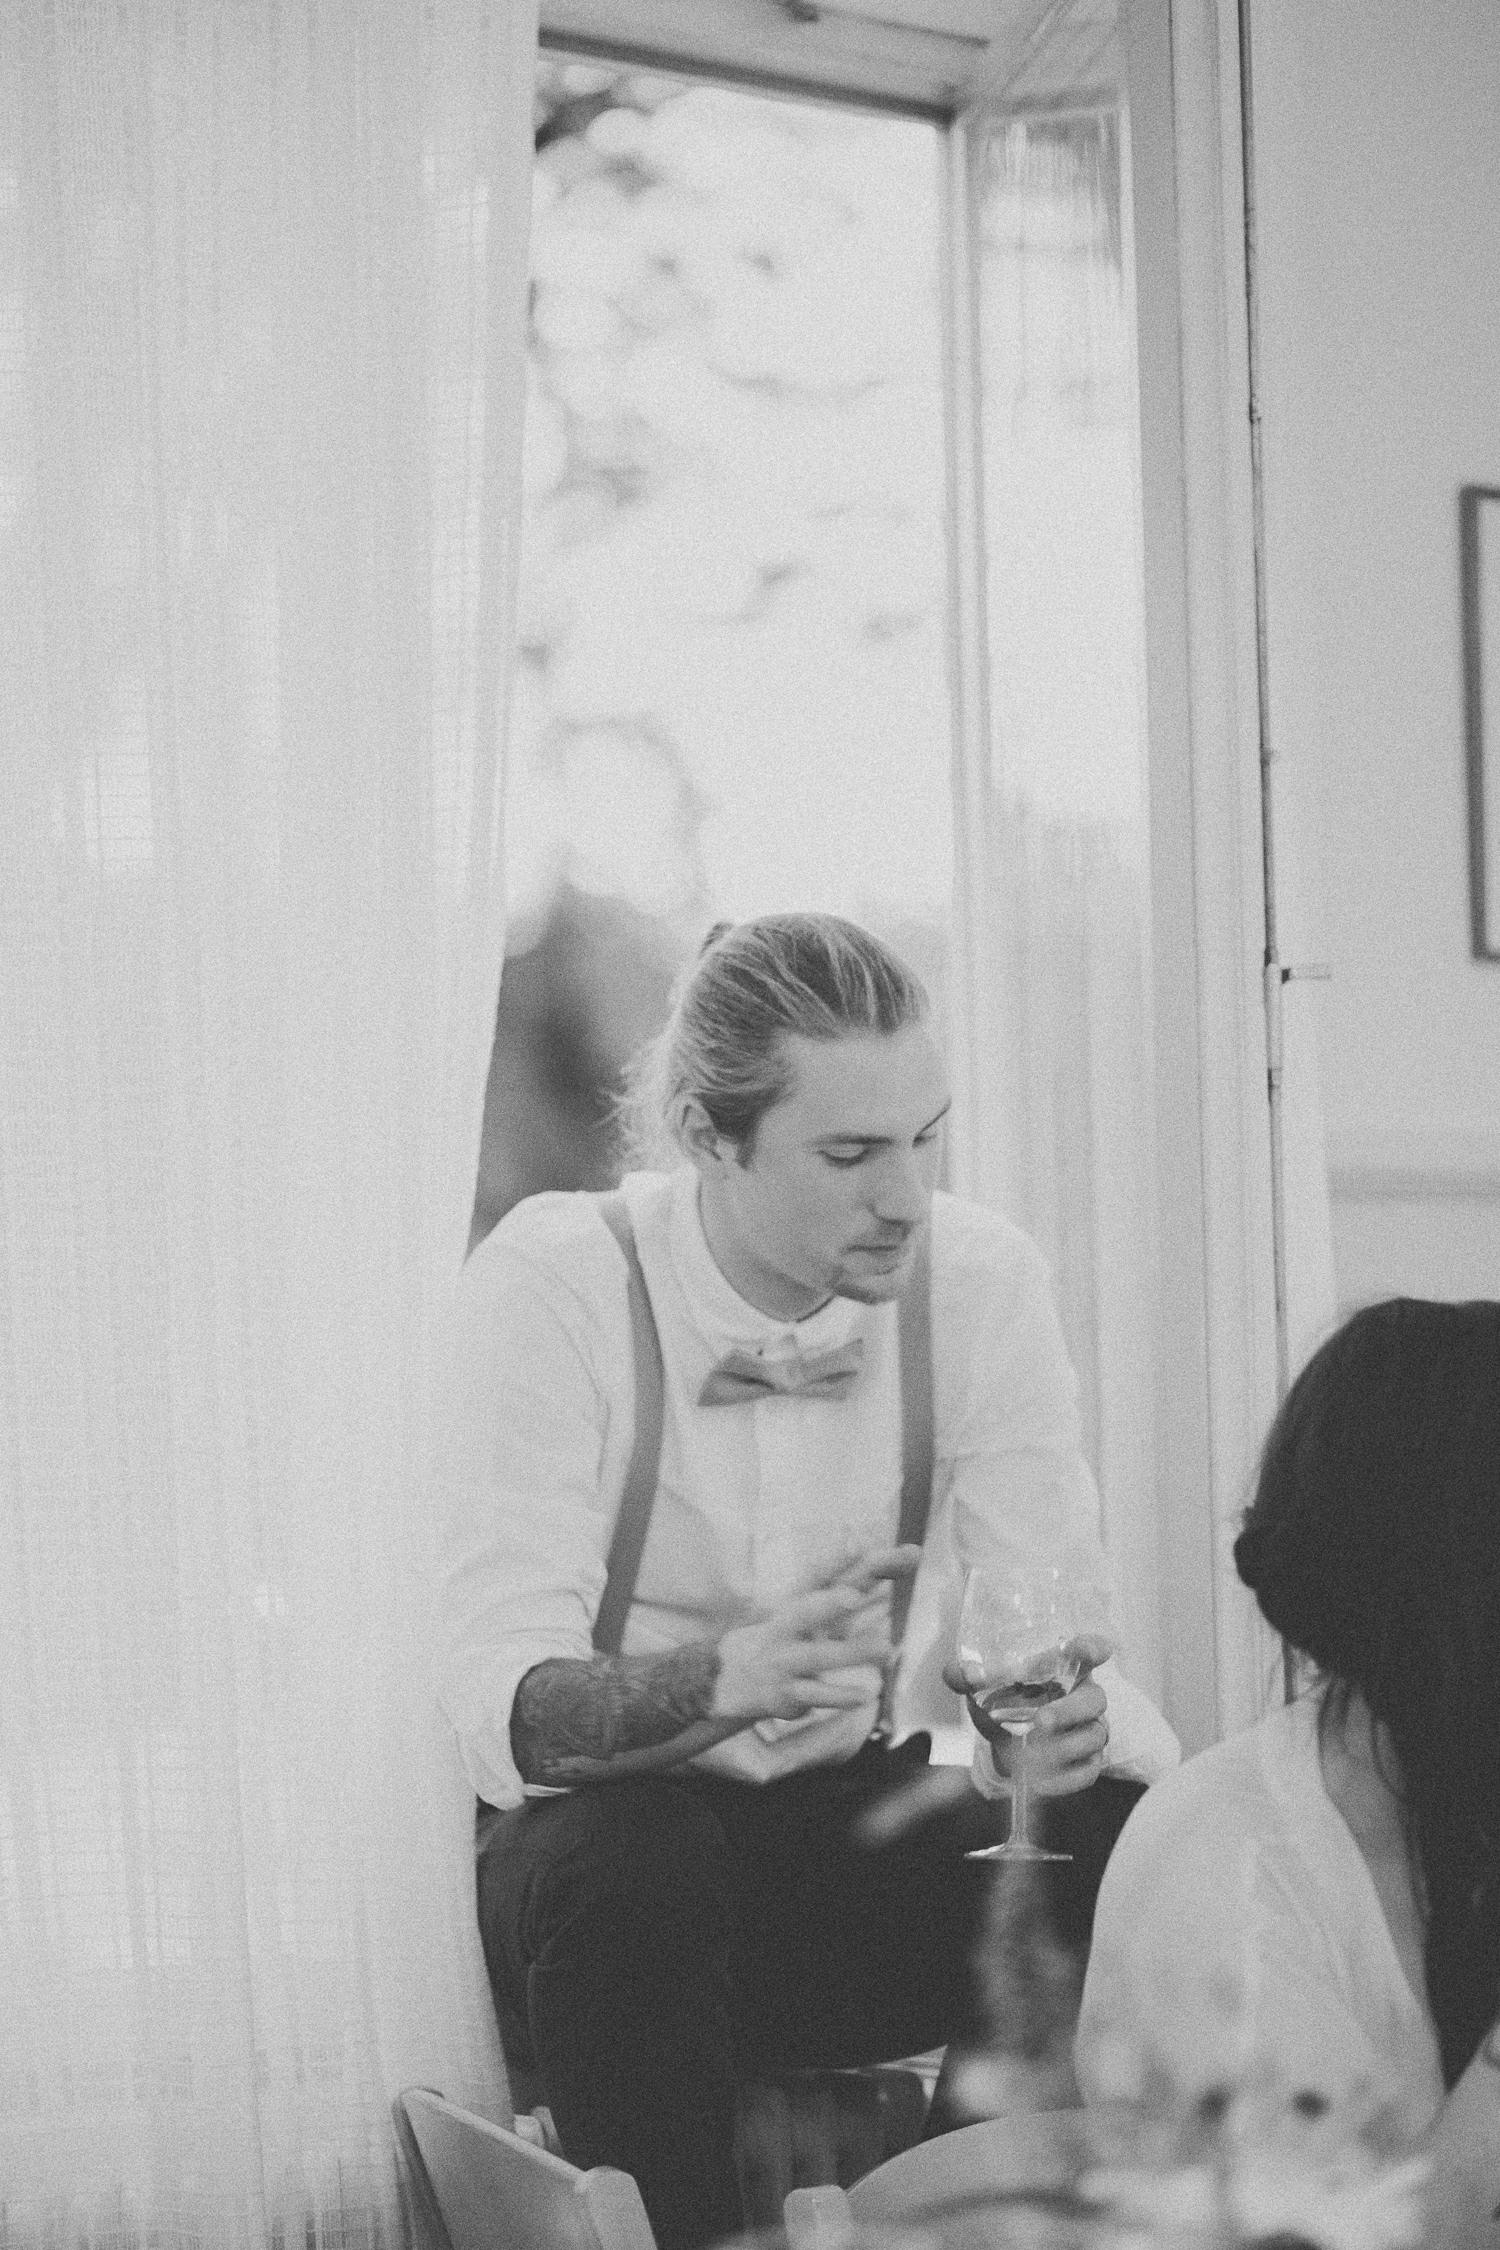 L&A+Wedding+in+Sweden+-+Liron+Erel+Photographer+0142.jpg